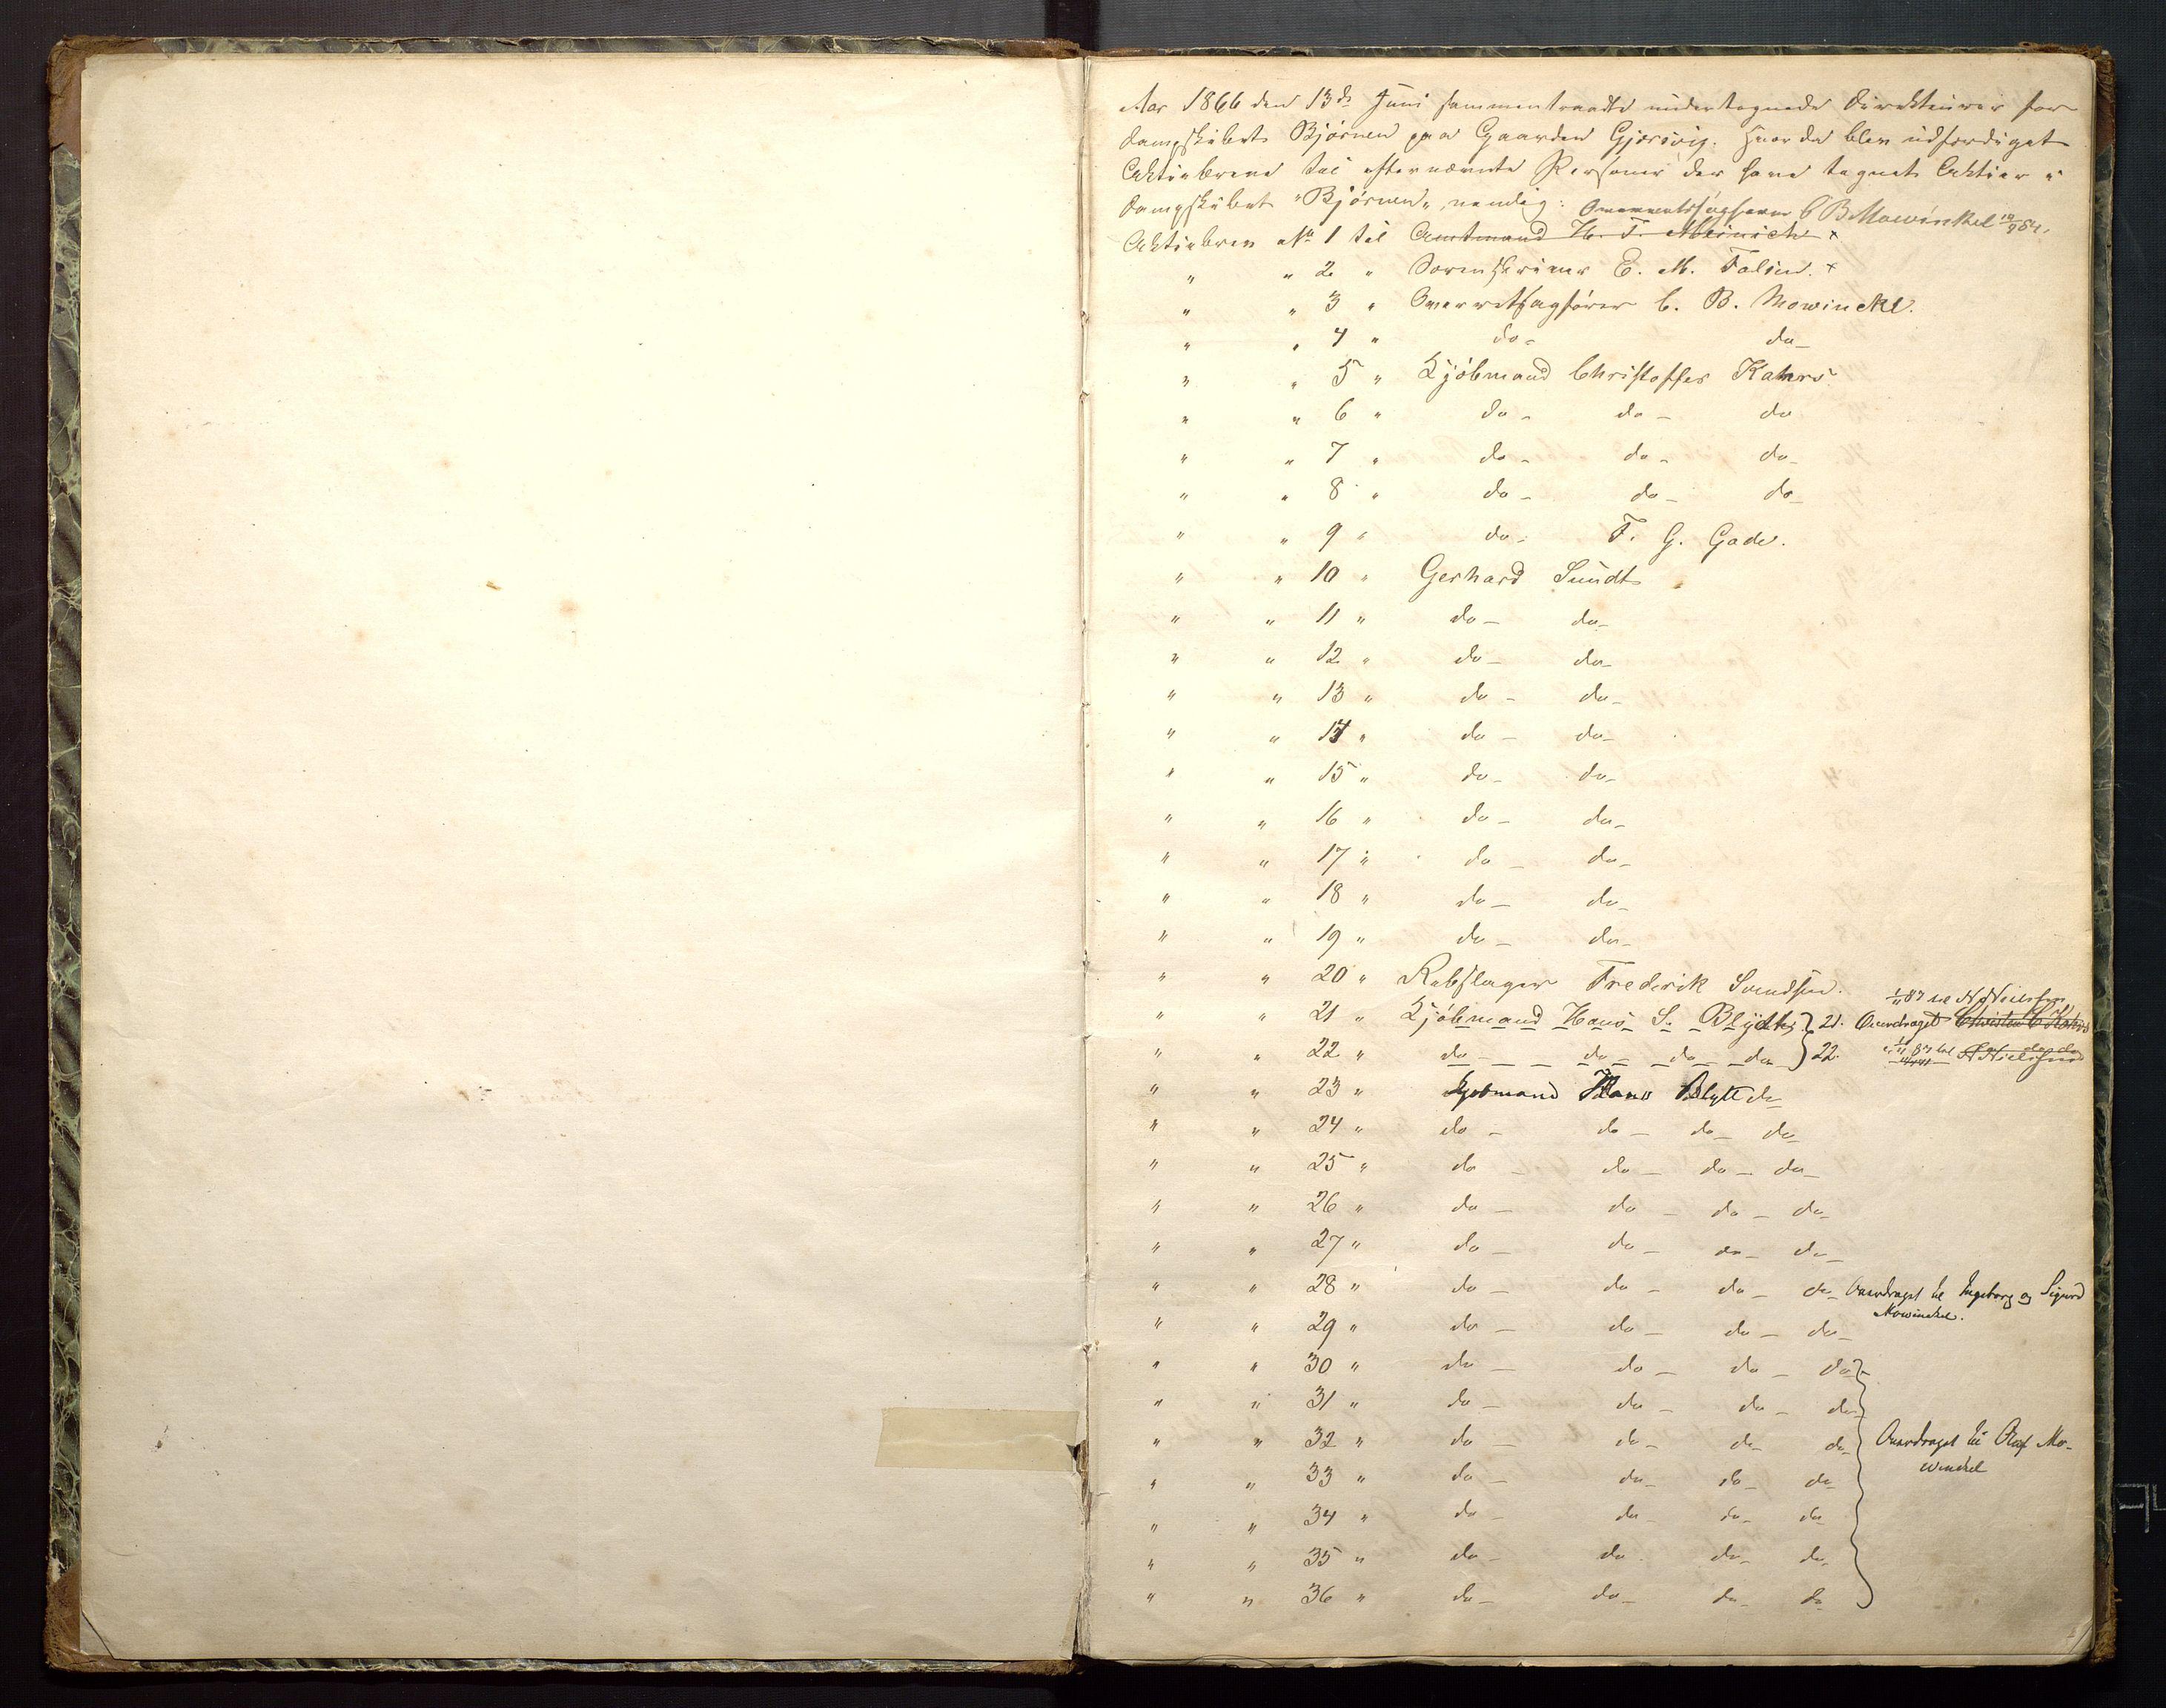 IKAH, Dampskipet DS Bjørnen, A/Aa/L0001: Styreprotokoll for DS Bjørnen, 1866-1891, p. 1